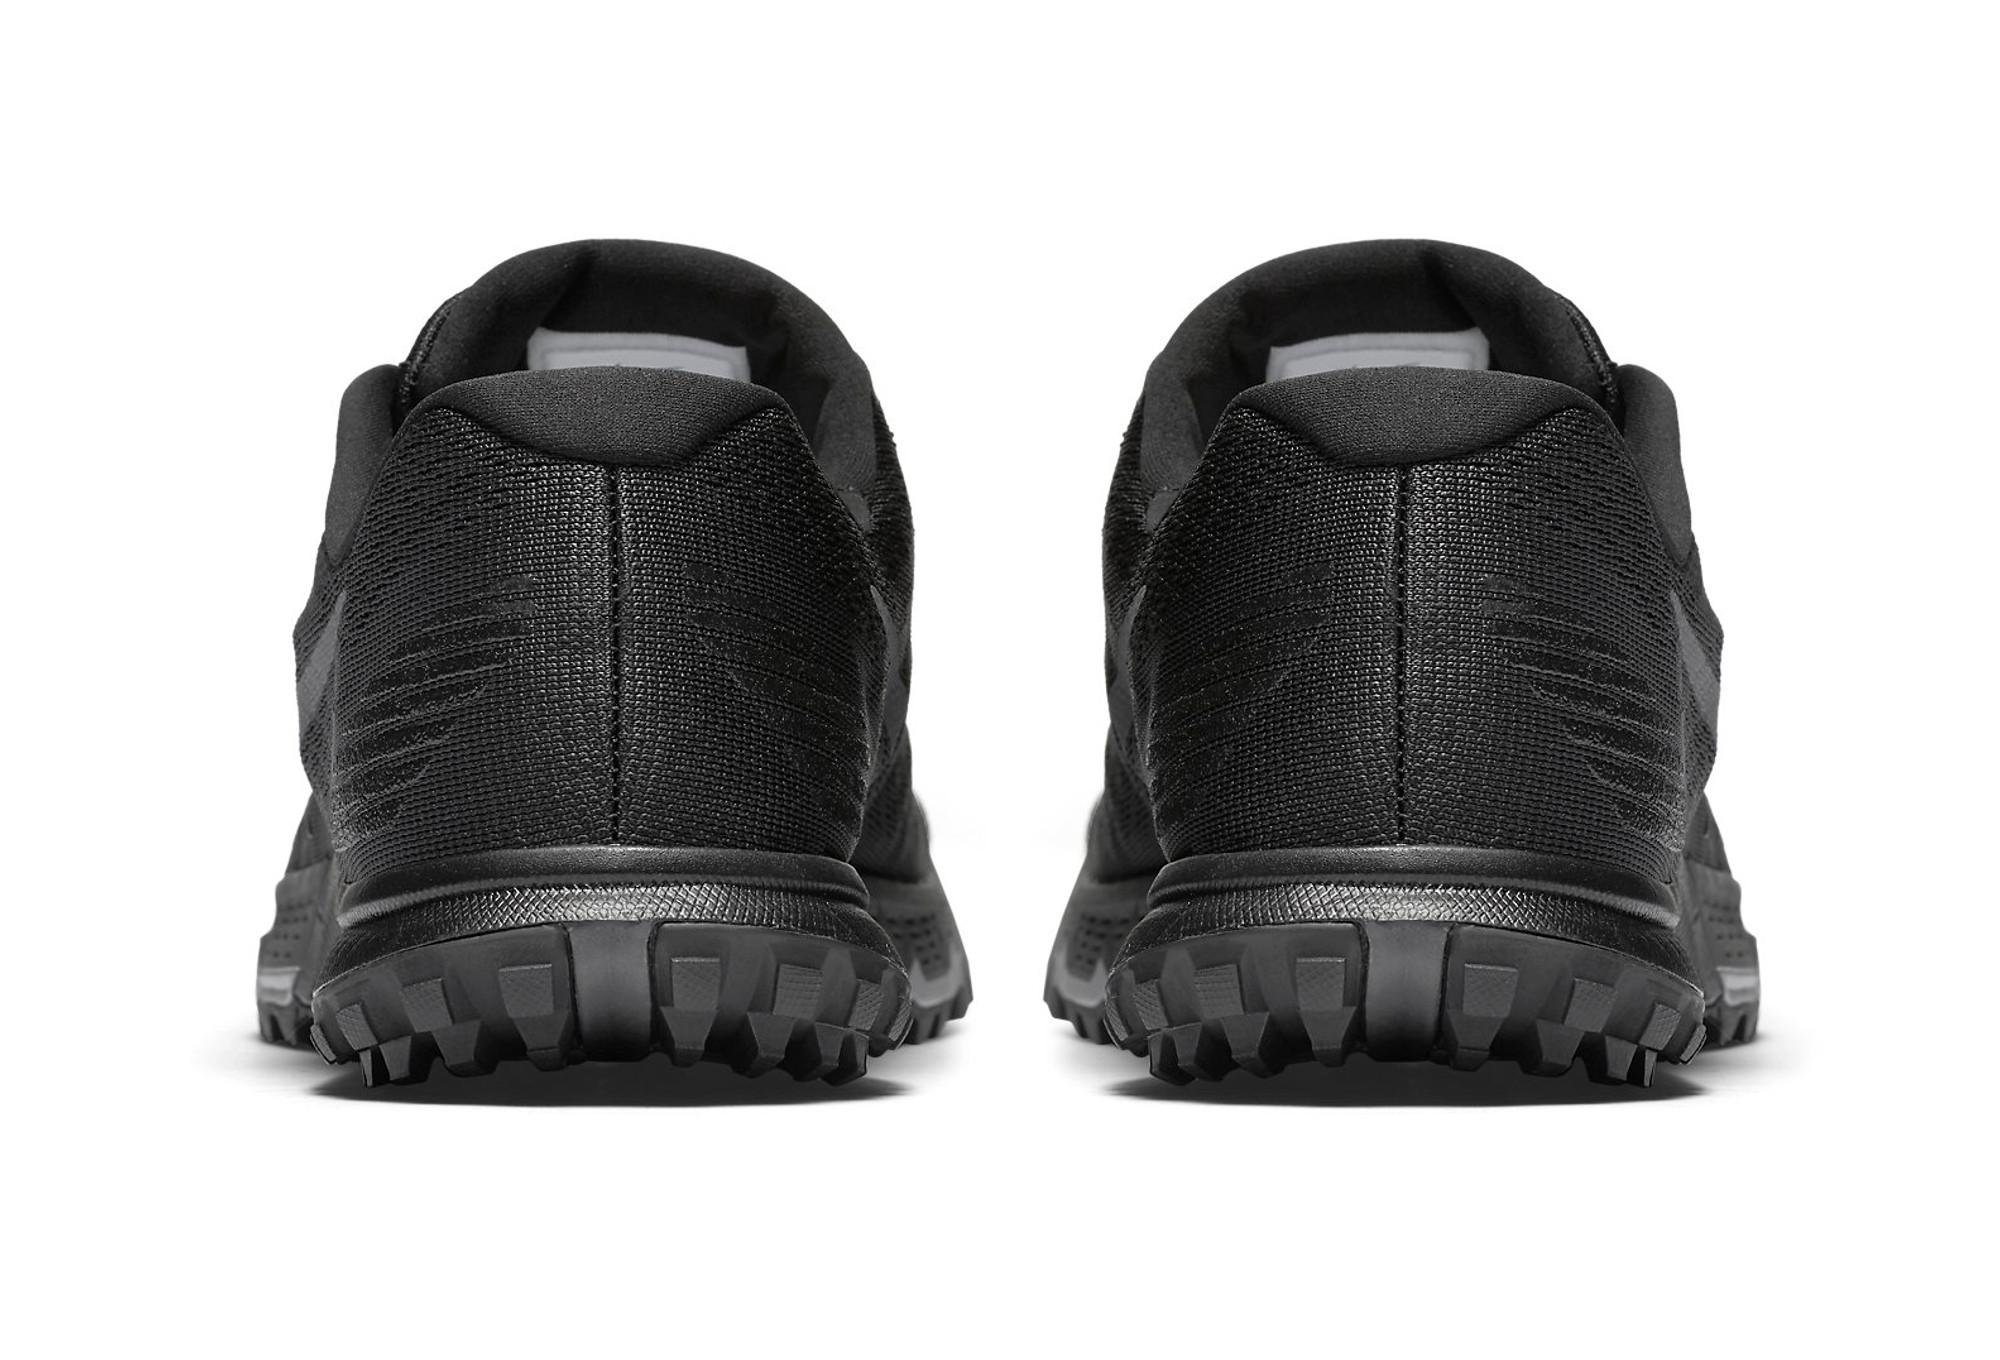 newest 806d4 57dc6 NIKE ZOOM TERRA KIGER 3 Shoes Black